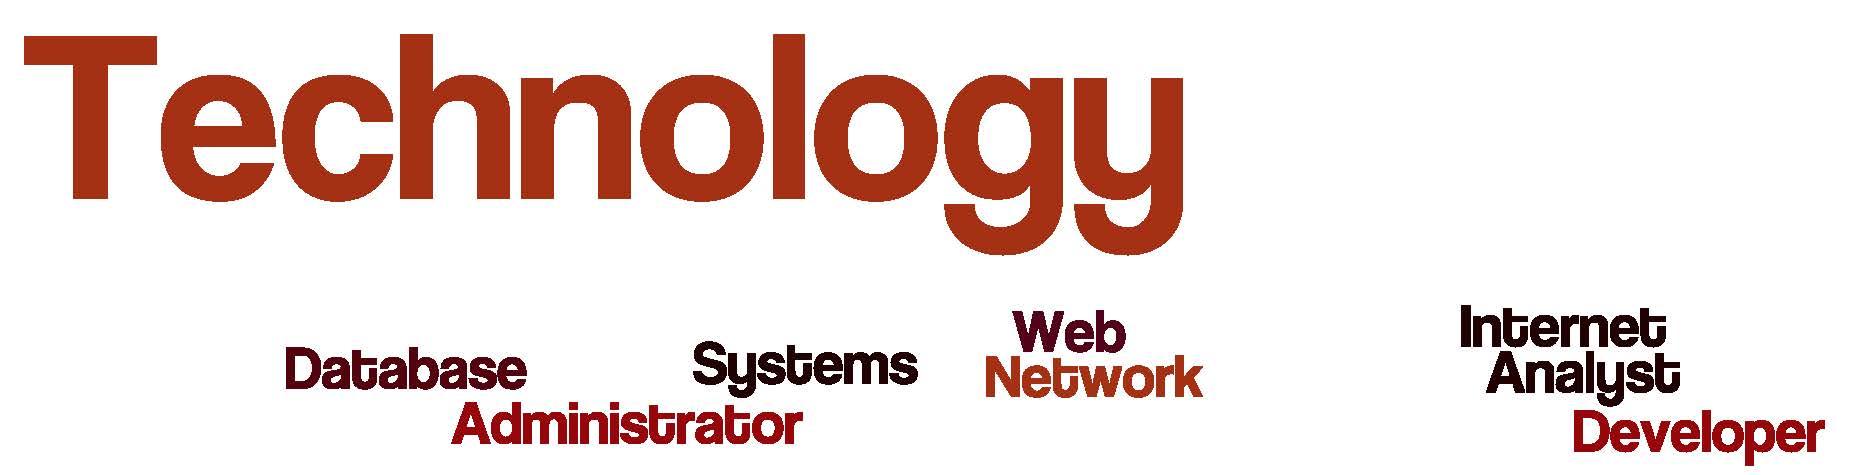 Technology WEb Page Slider